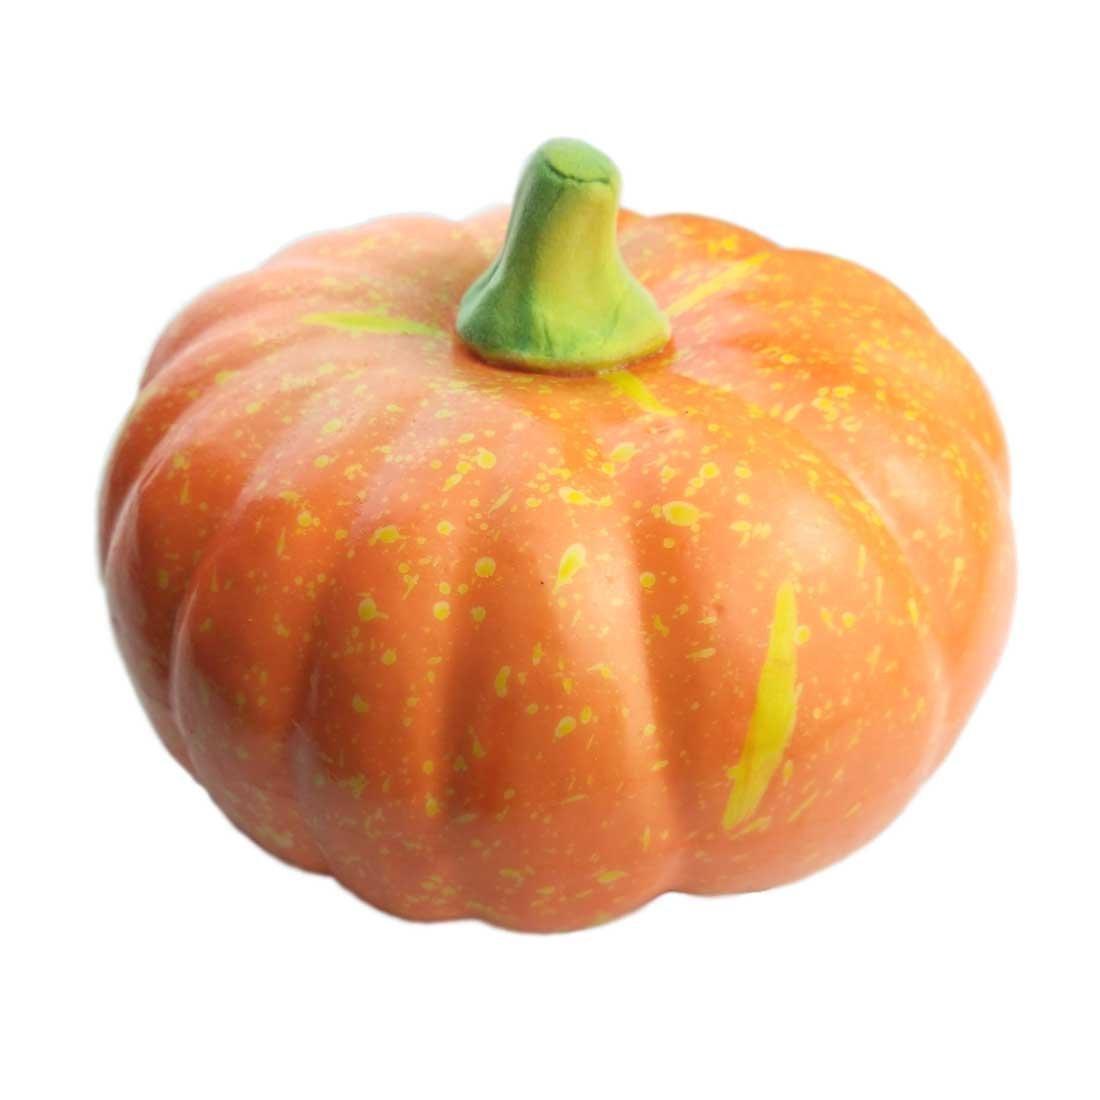 Lorigun Artificial Simulation Big Pumpkin 7.8 Inch Lifelike Fake Vegetable Halloween Home Decoration Company Festive Decor